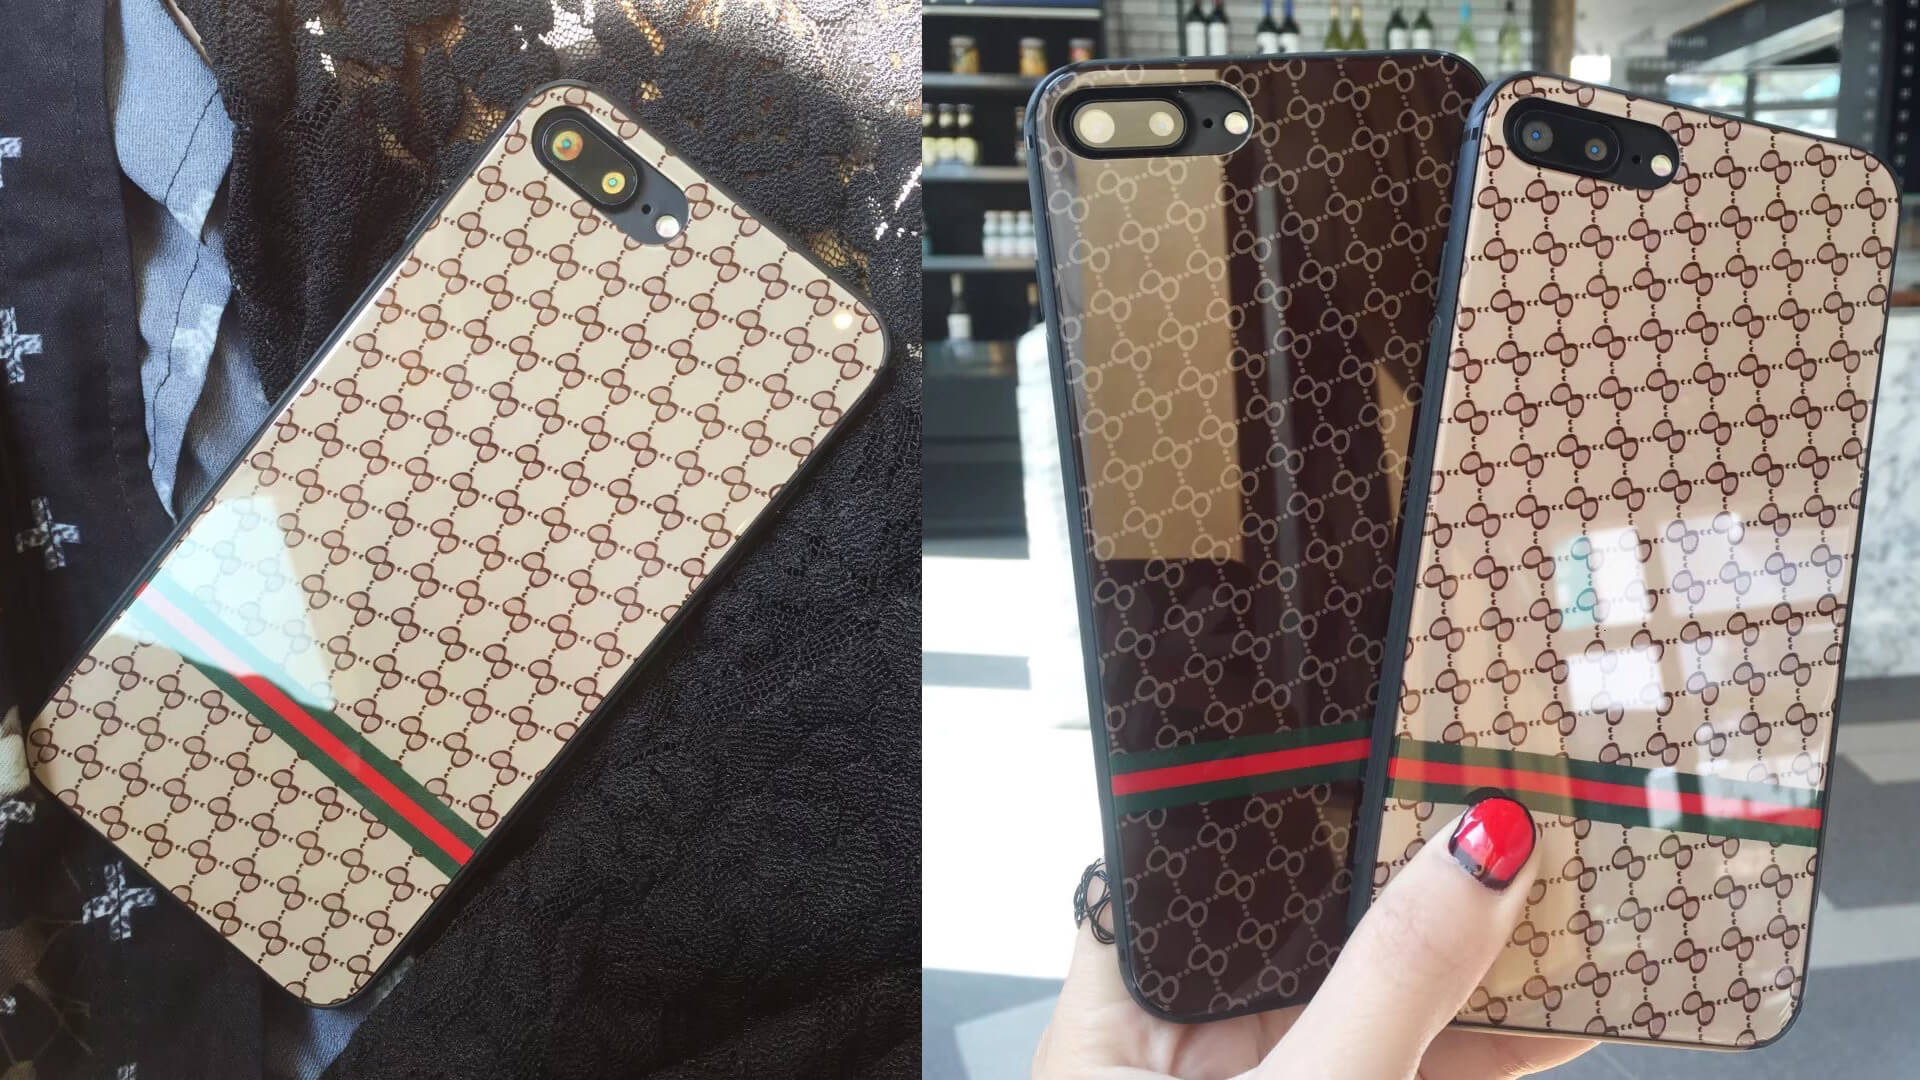 Best Designer Cases for iPhone 7 Plus in 2021 - iGeeksBlog